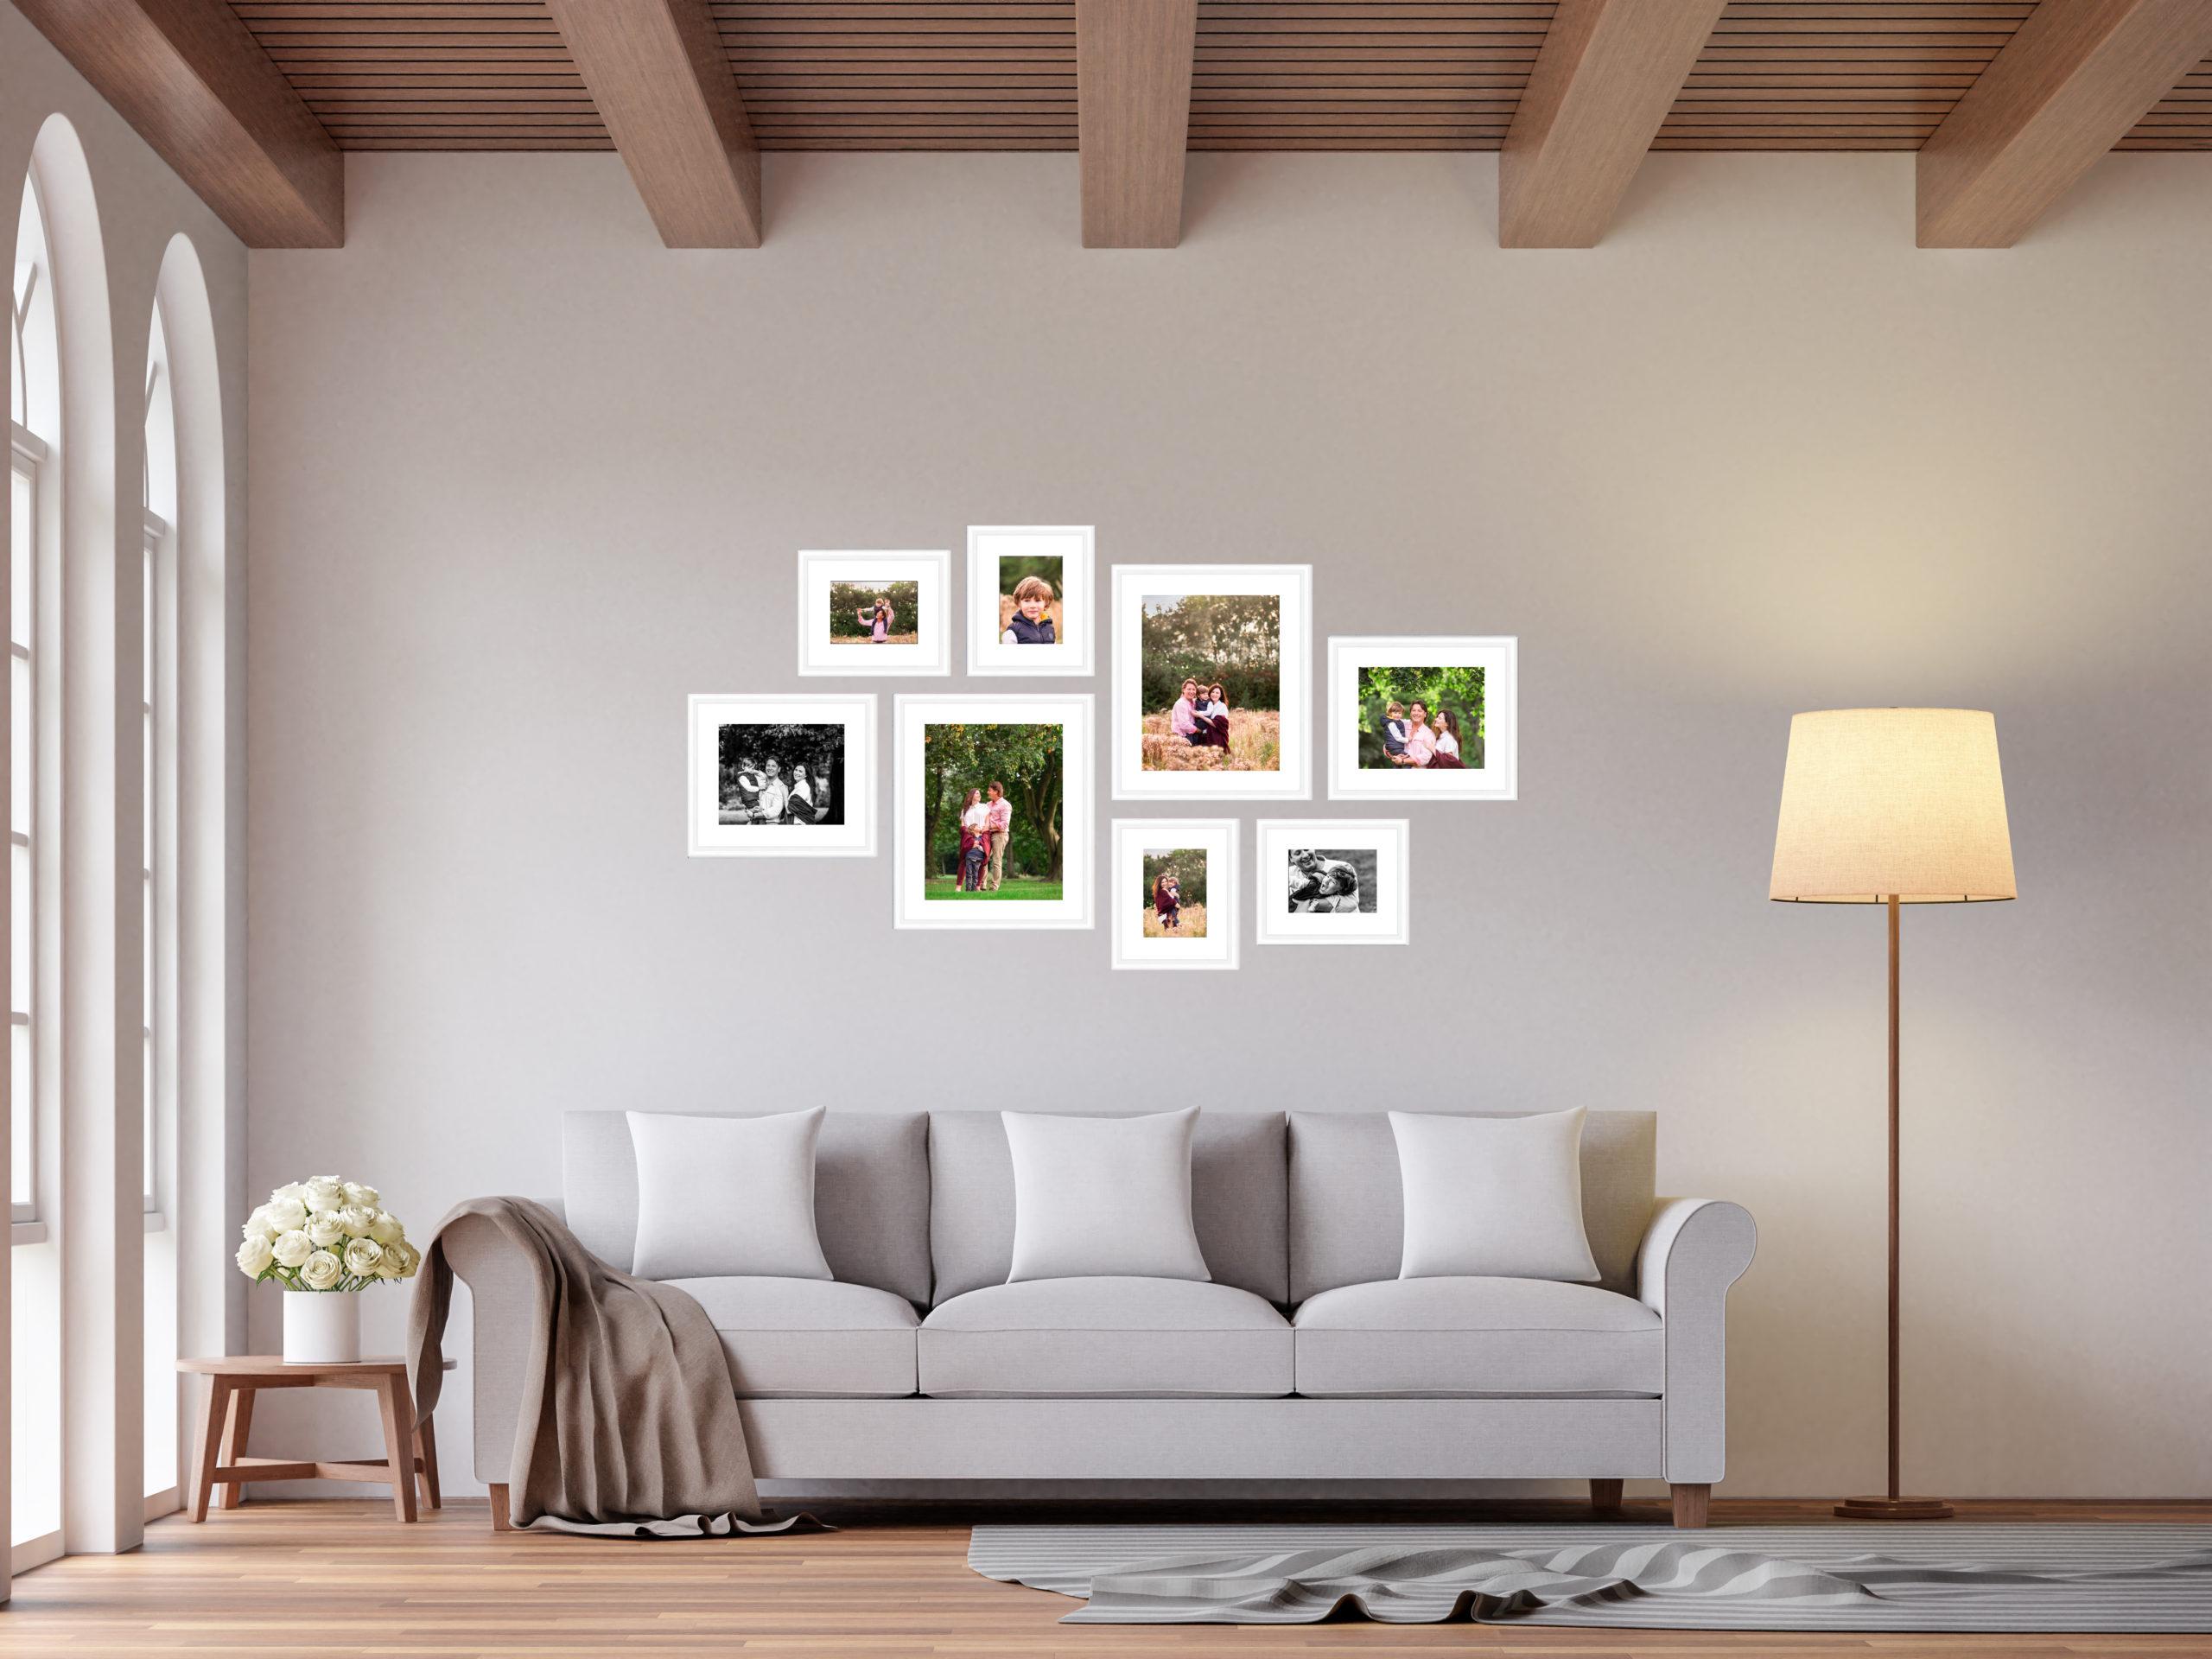 wall art - 8 photo frame gallery